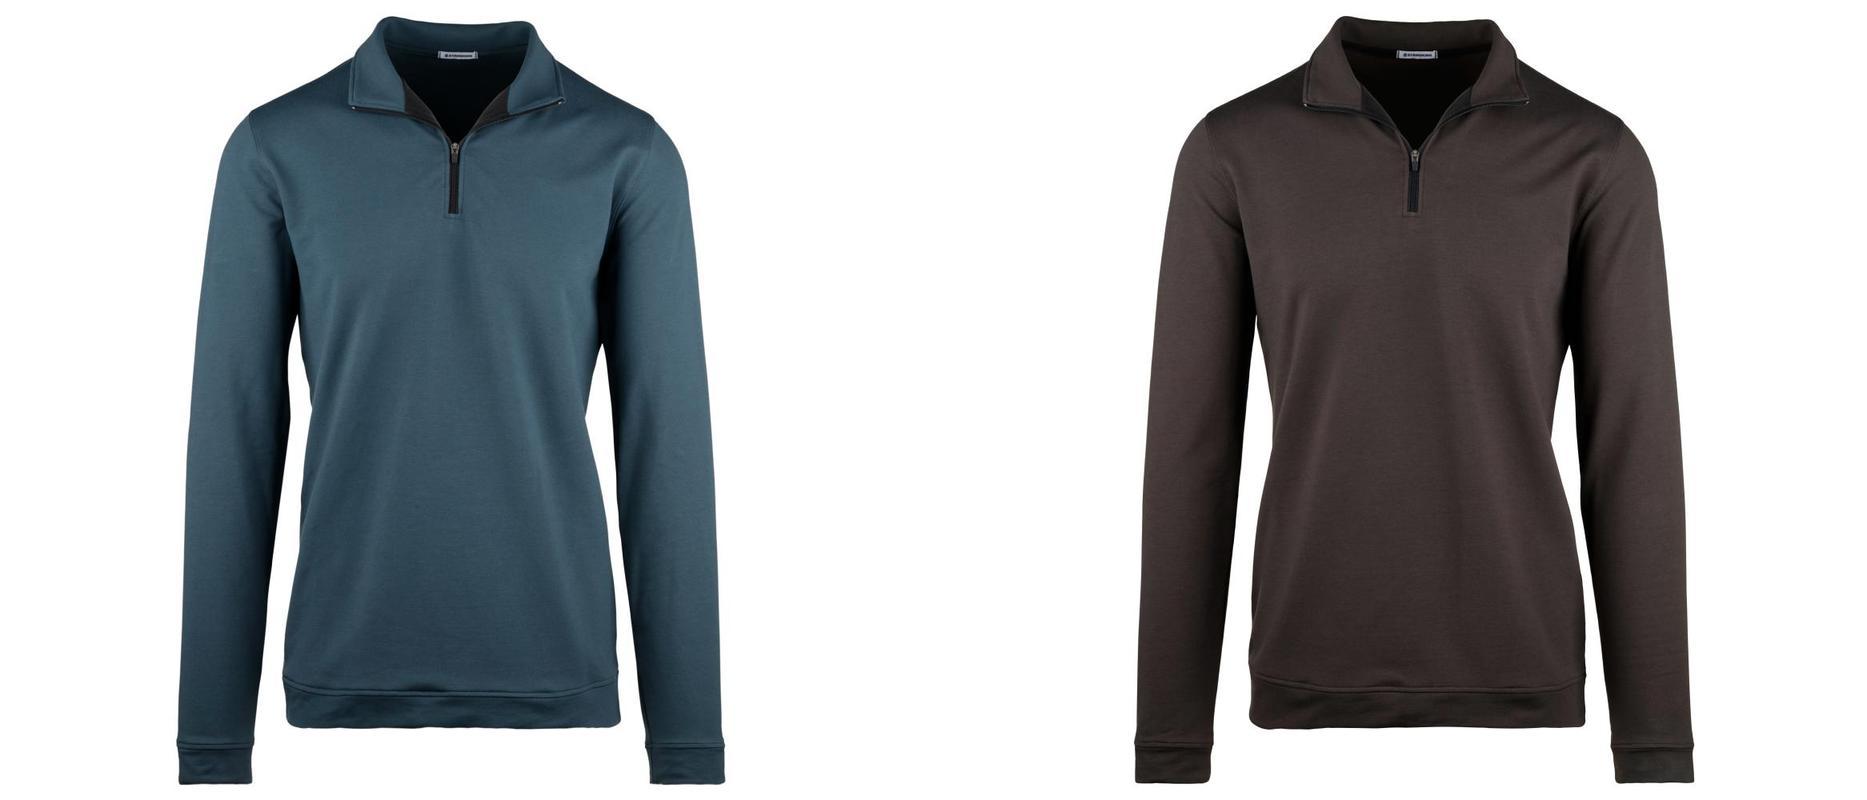 StringKing Apparel Outerwear Sweatshirt Quarter Zip Category Image Blue Black